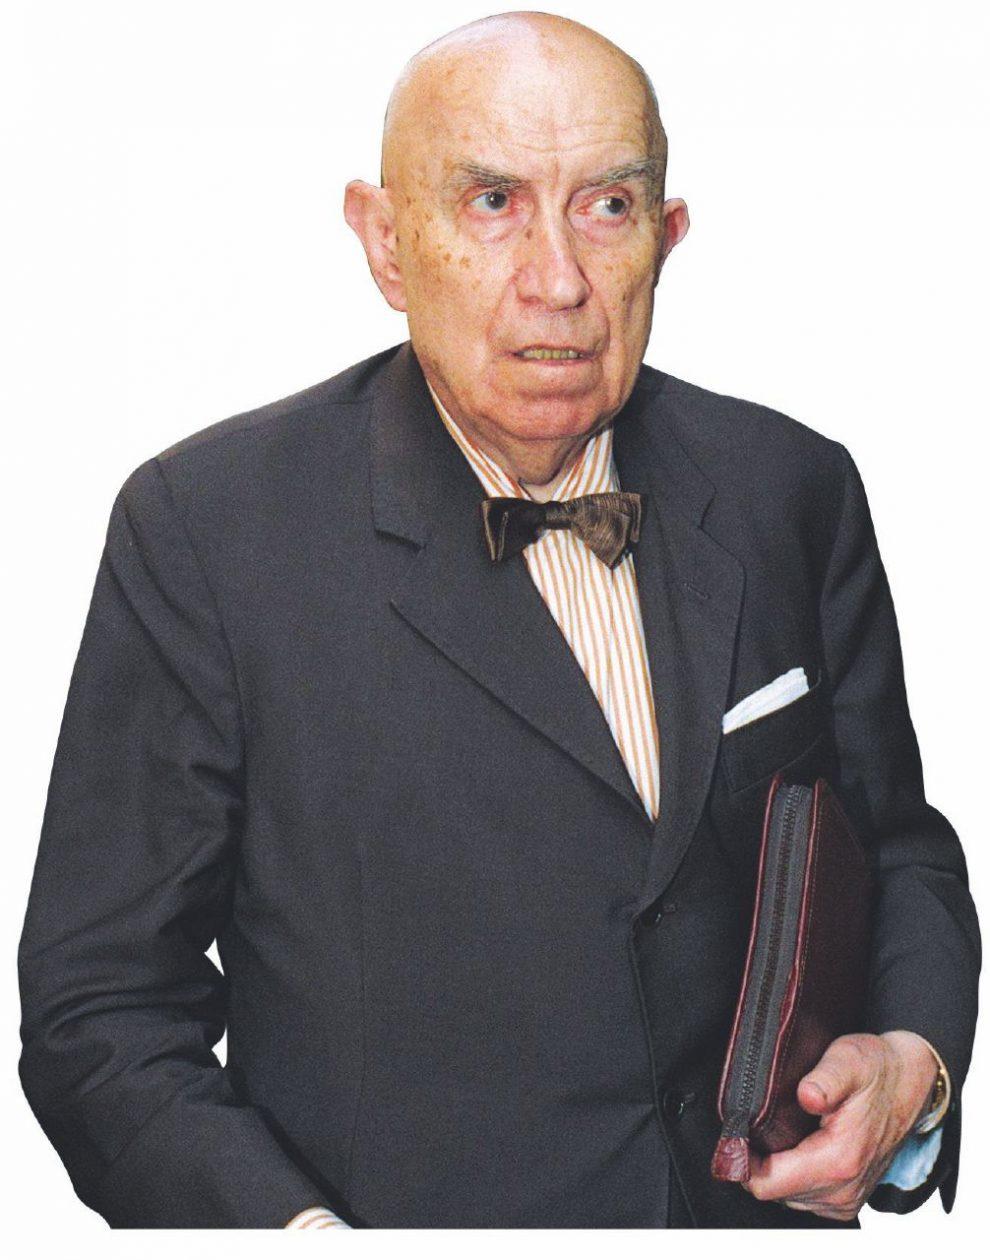 Gianfranco Miglio (1918-2001)